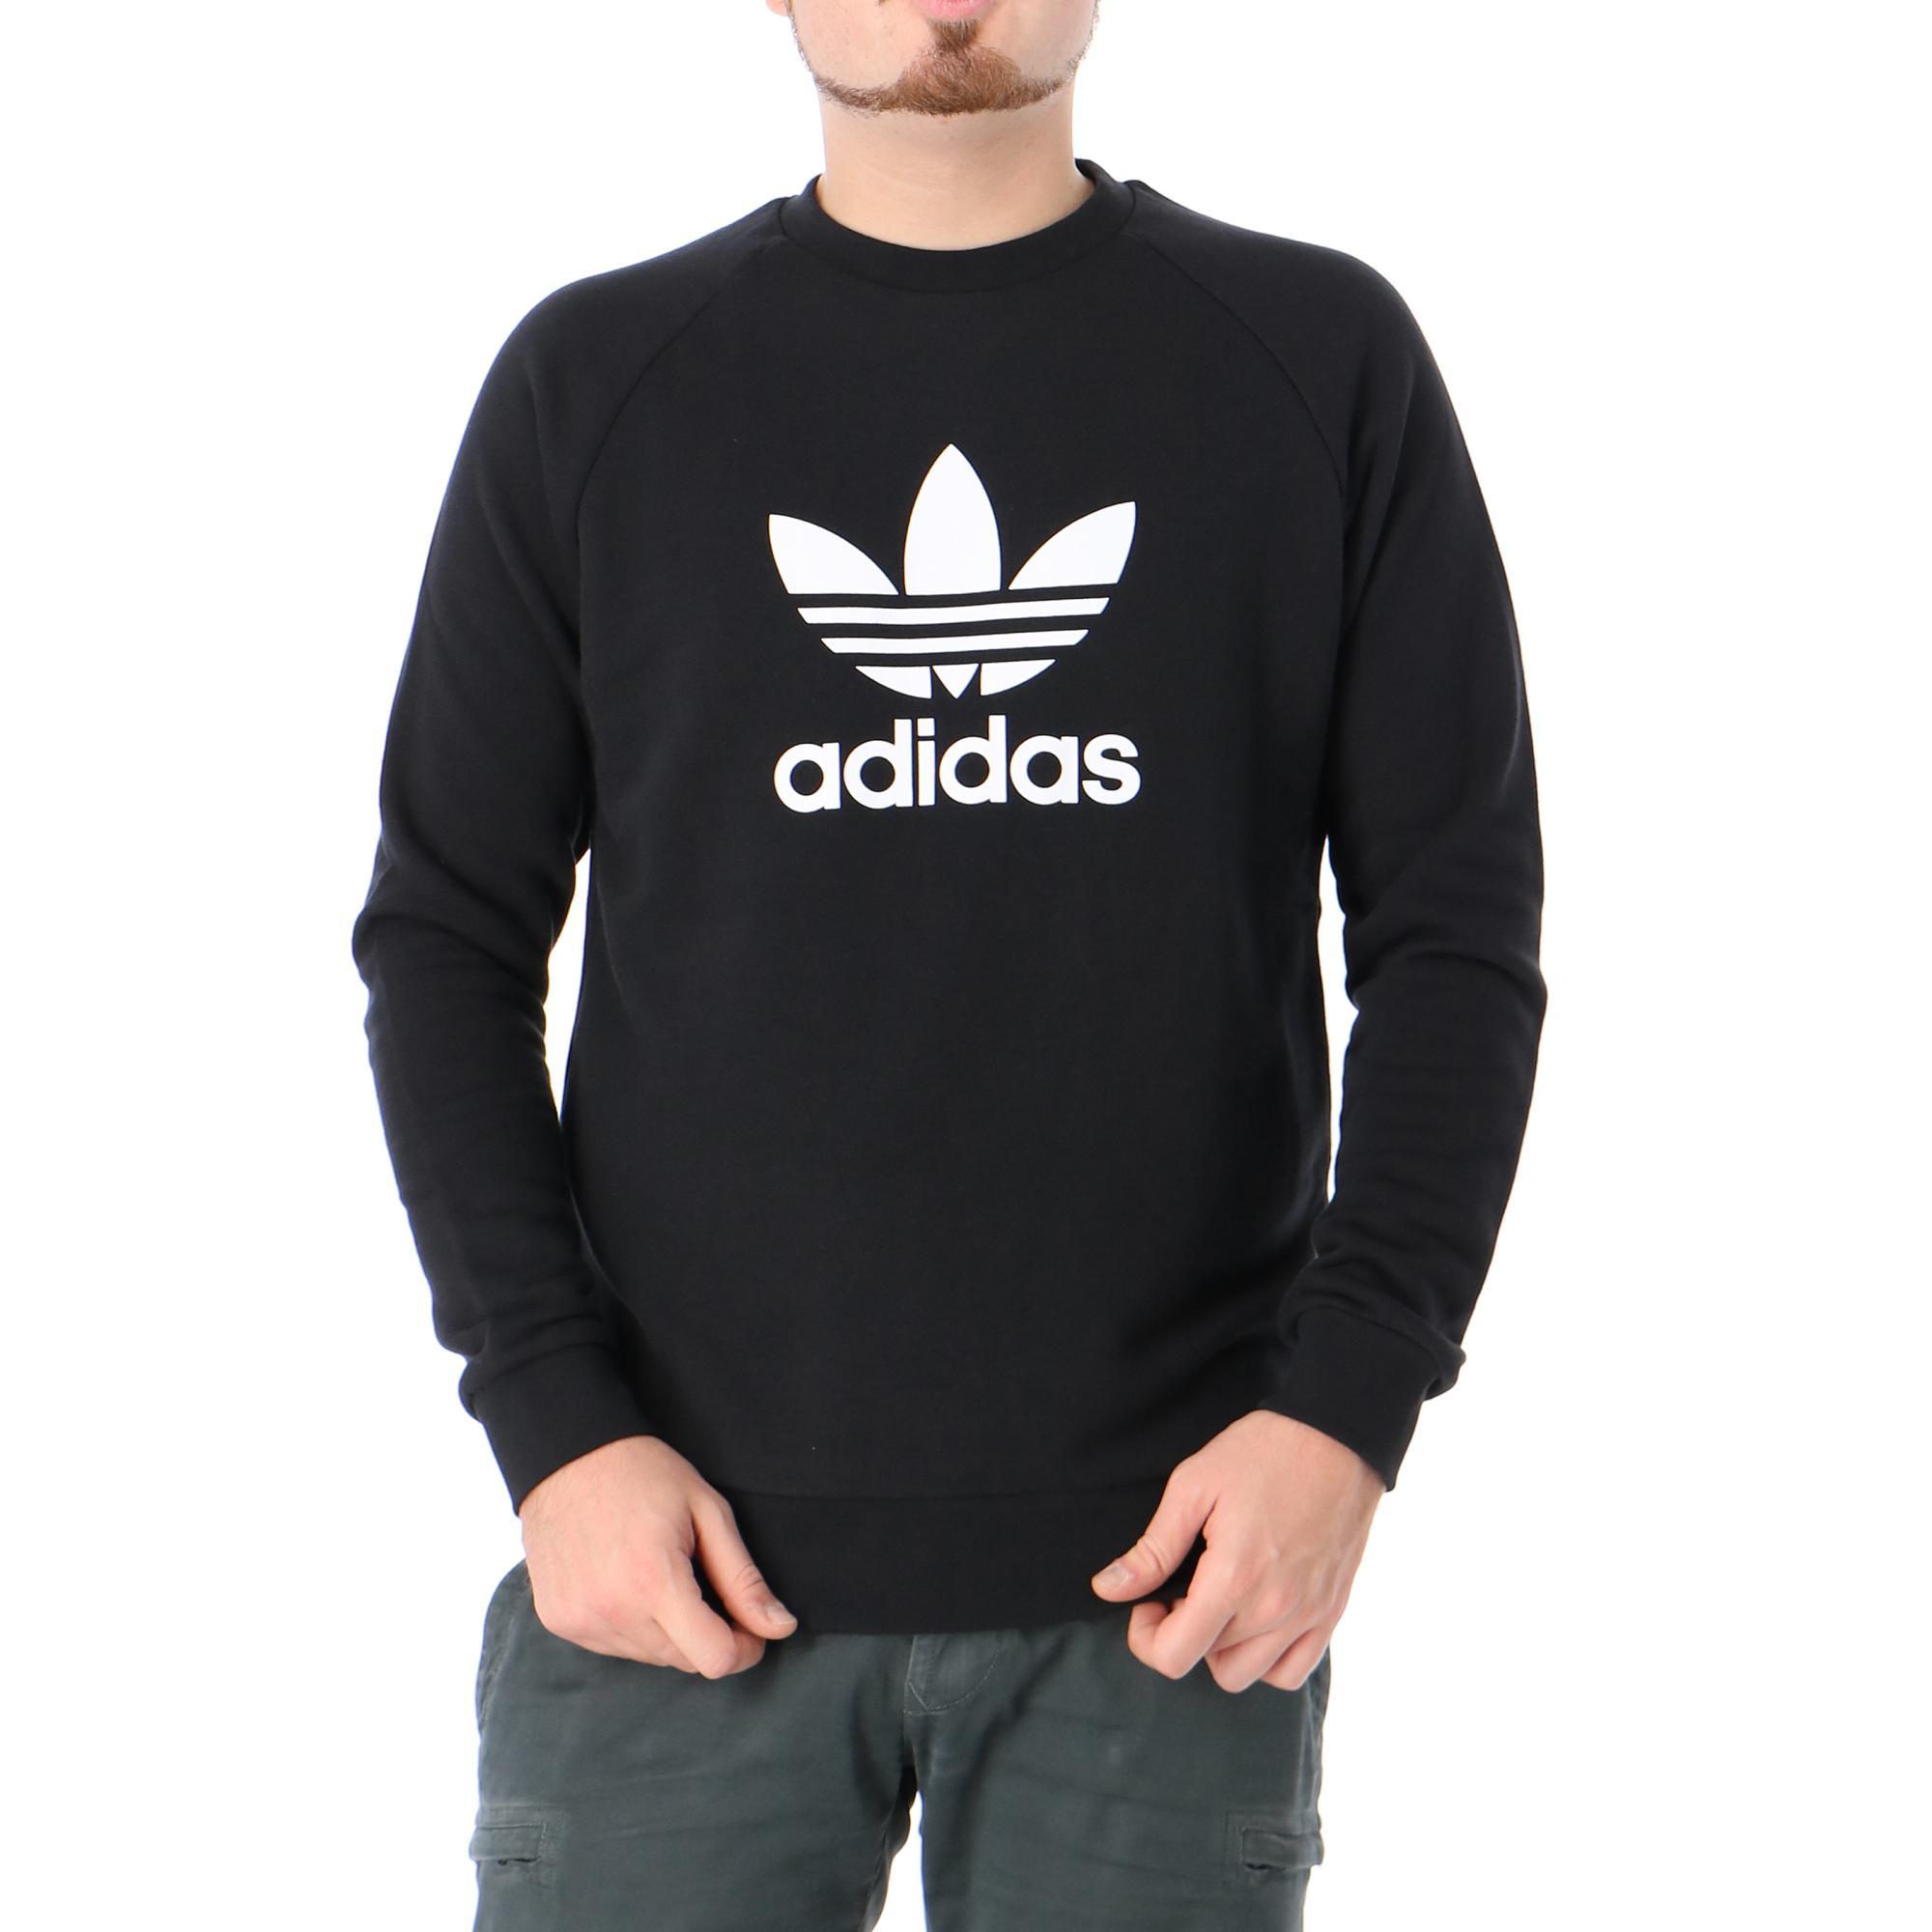 Adidas Trefoil Warm Up Crew <br/> Black